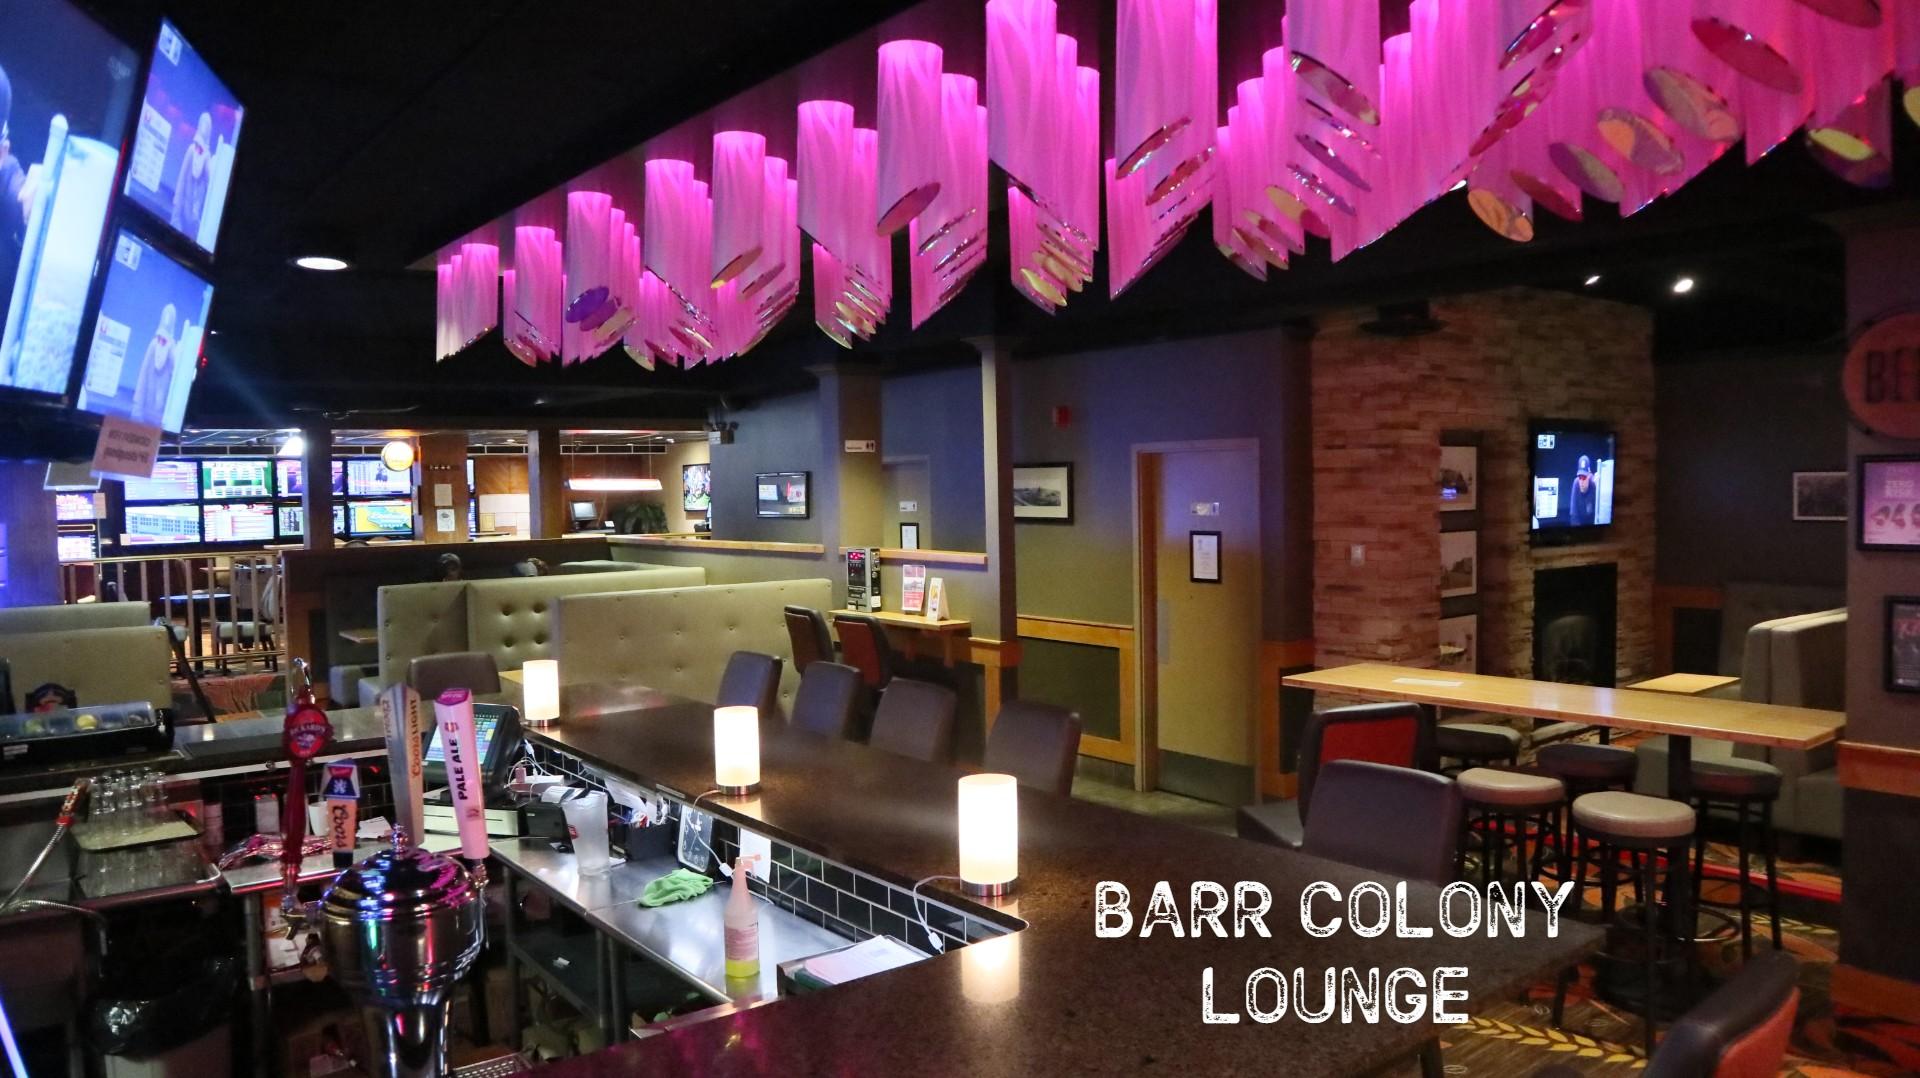 Bar colony lounge